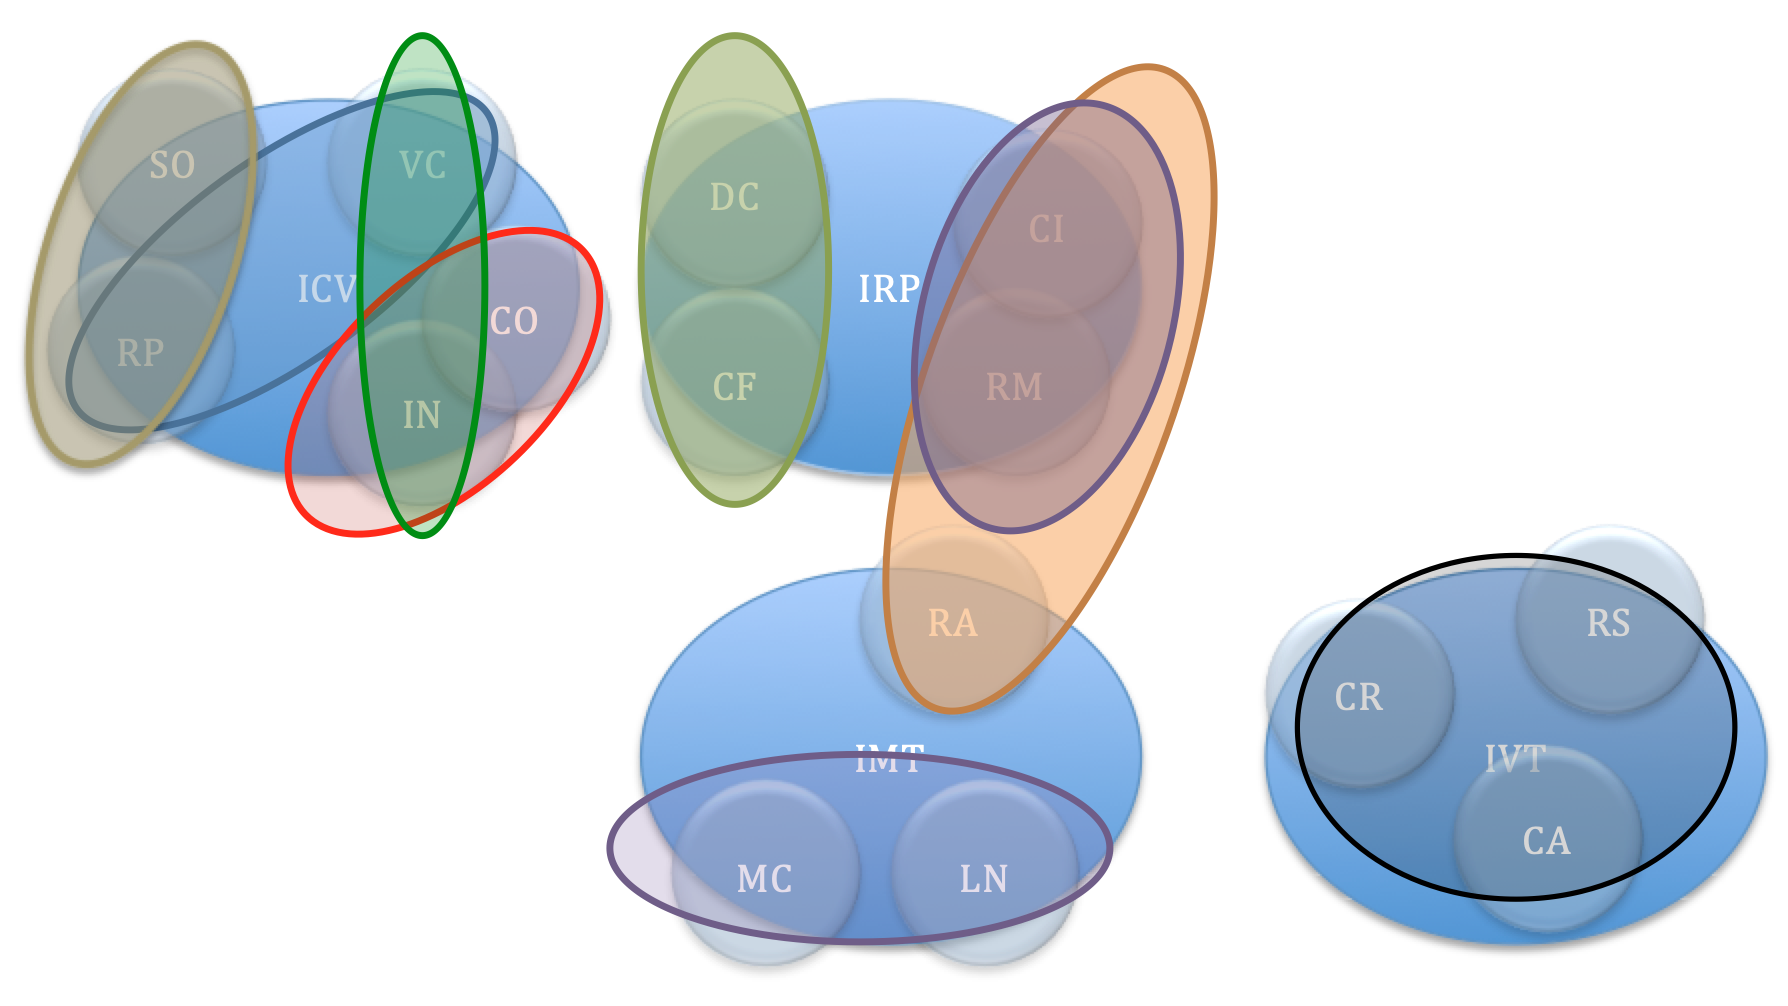 WISC – IV: analisi fattoriale CHC